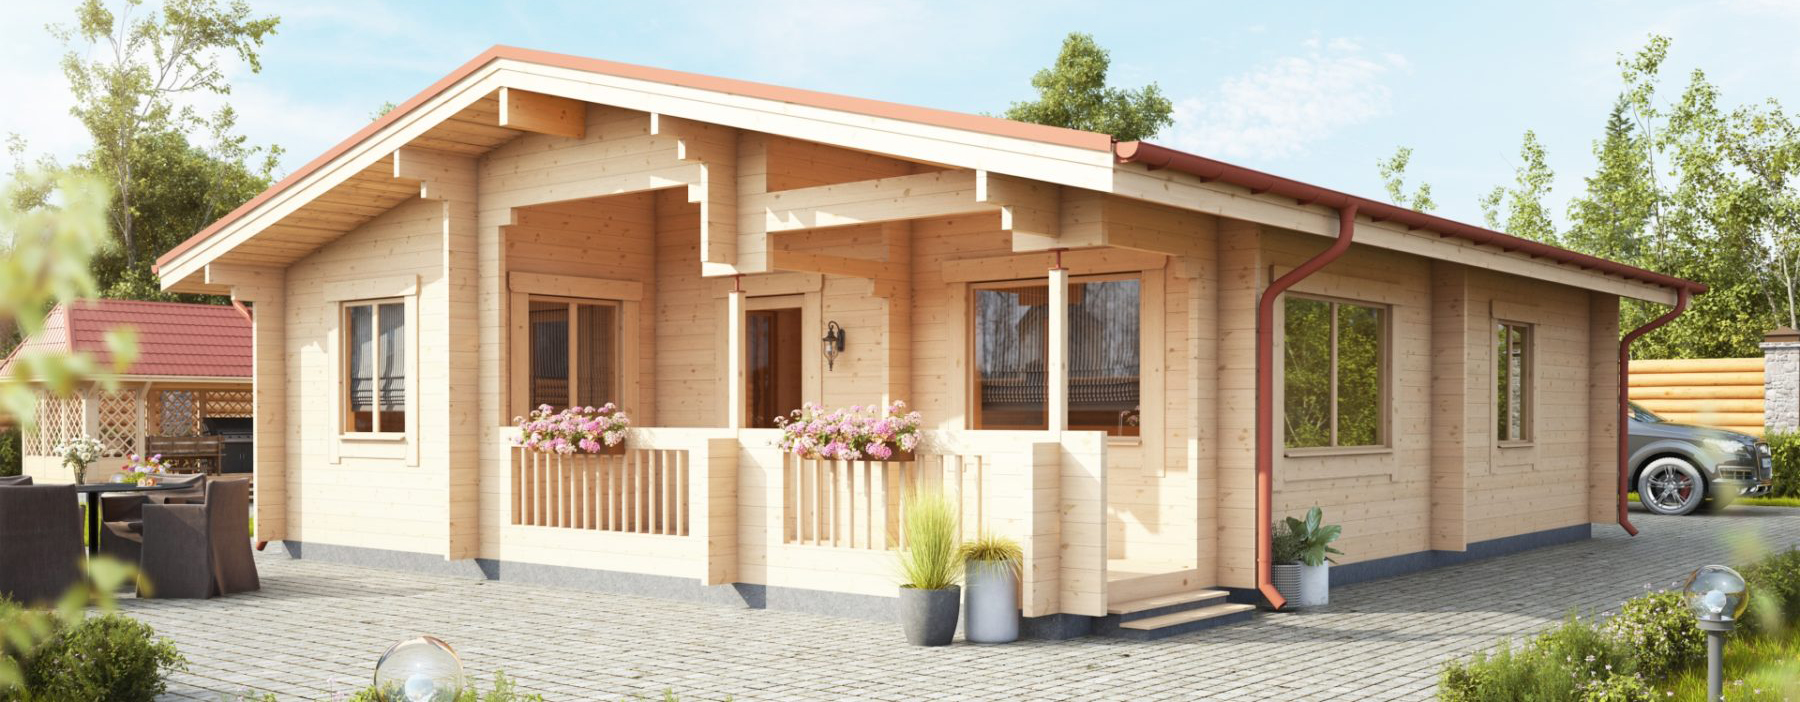 Residential Cabin - FELMOOR